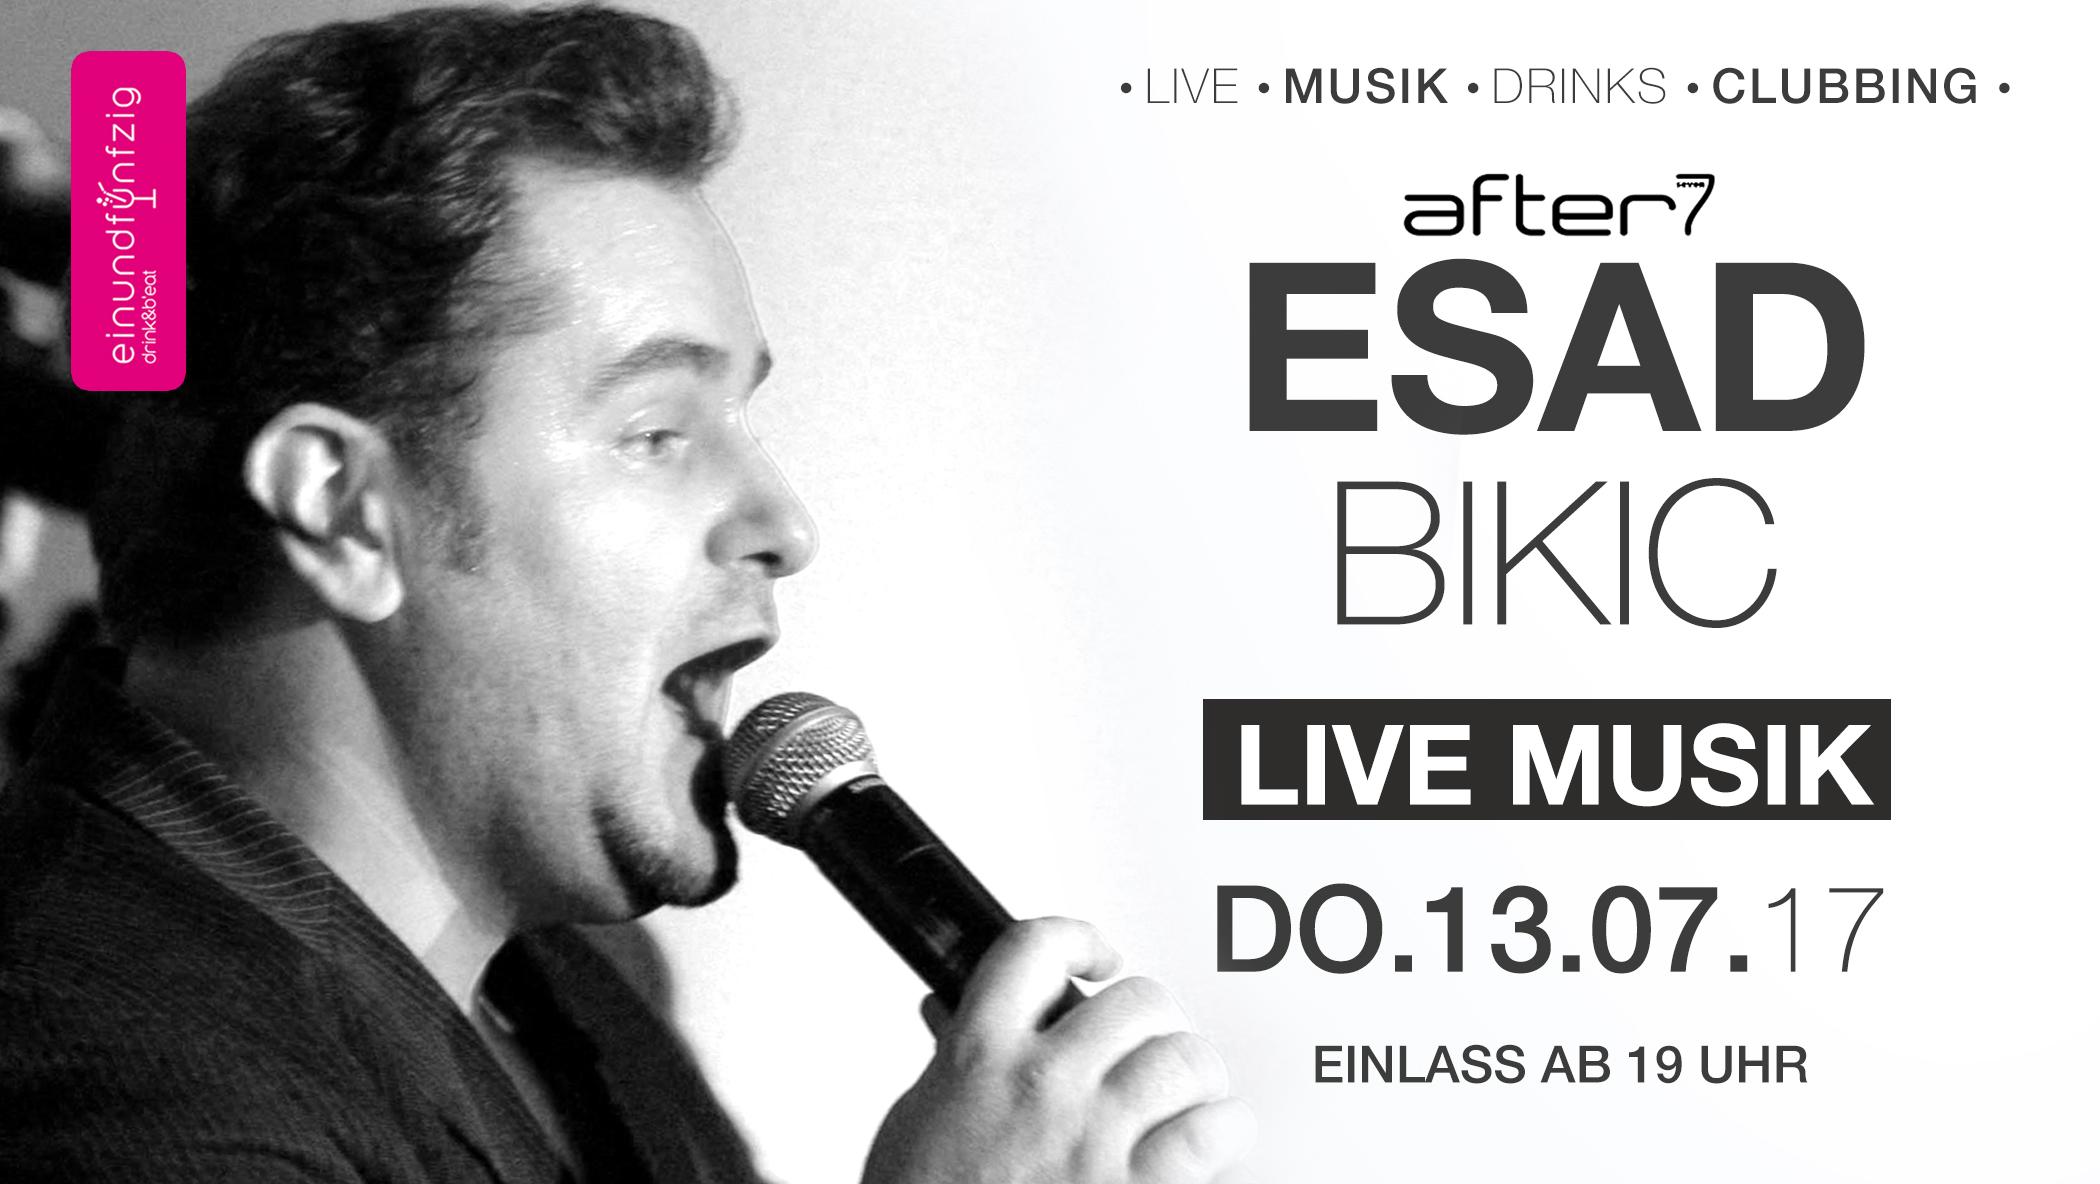 13.07.17 – Esad Bikic live @after7